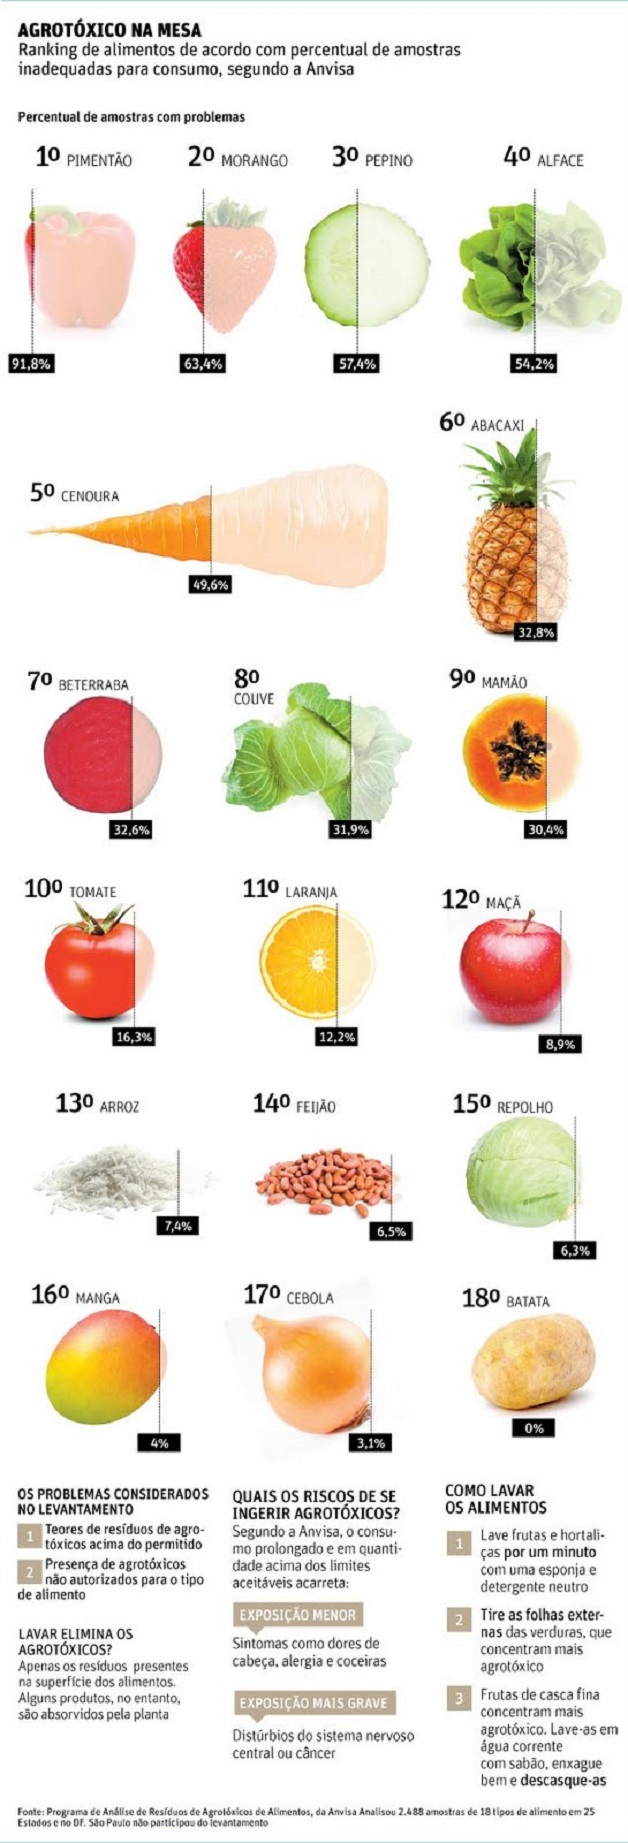 Agrotoxicos anvisa MVC